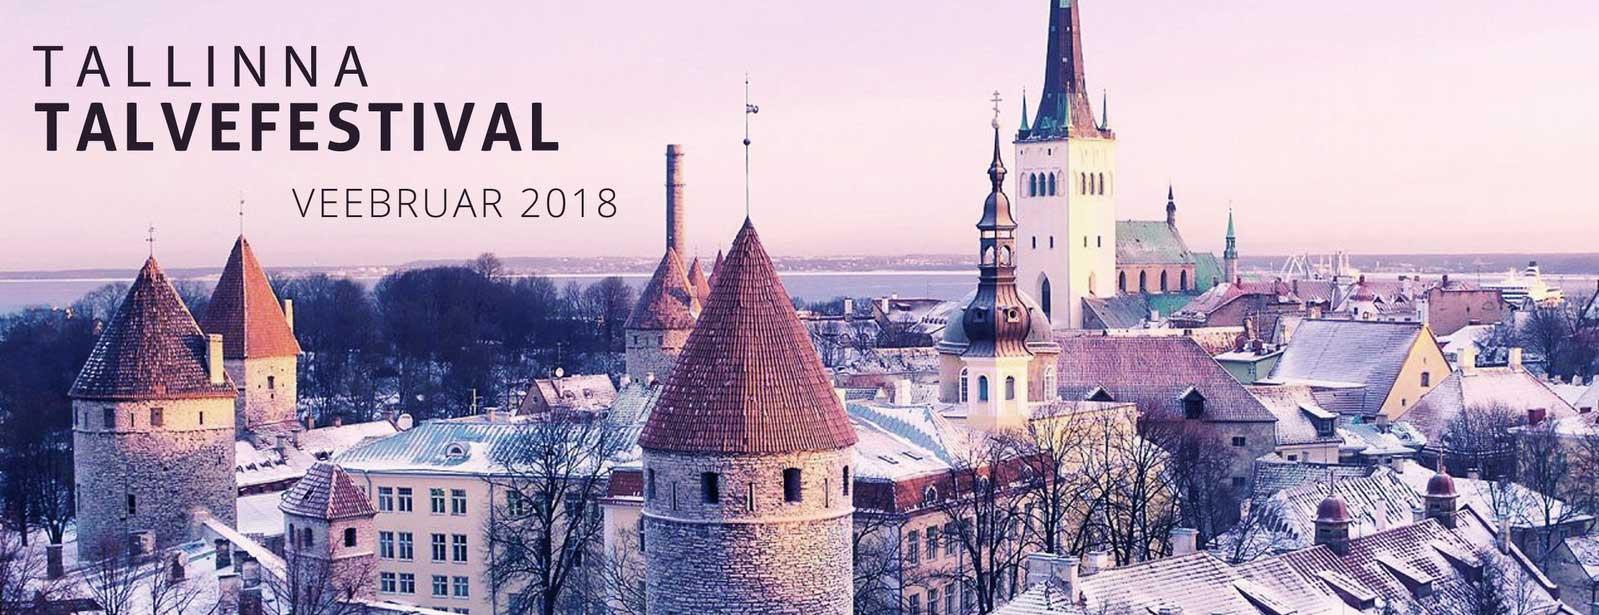 Tallinna TalveFestival 2018